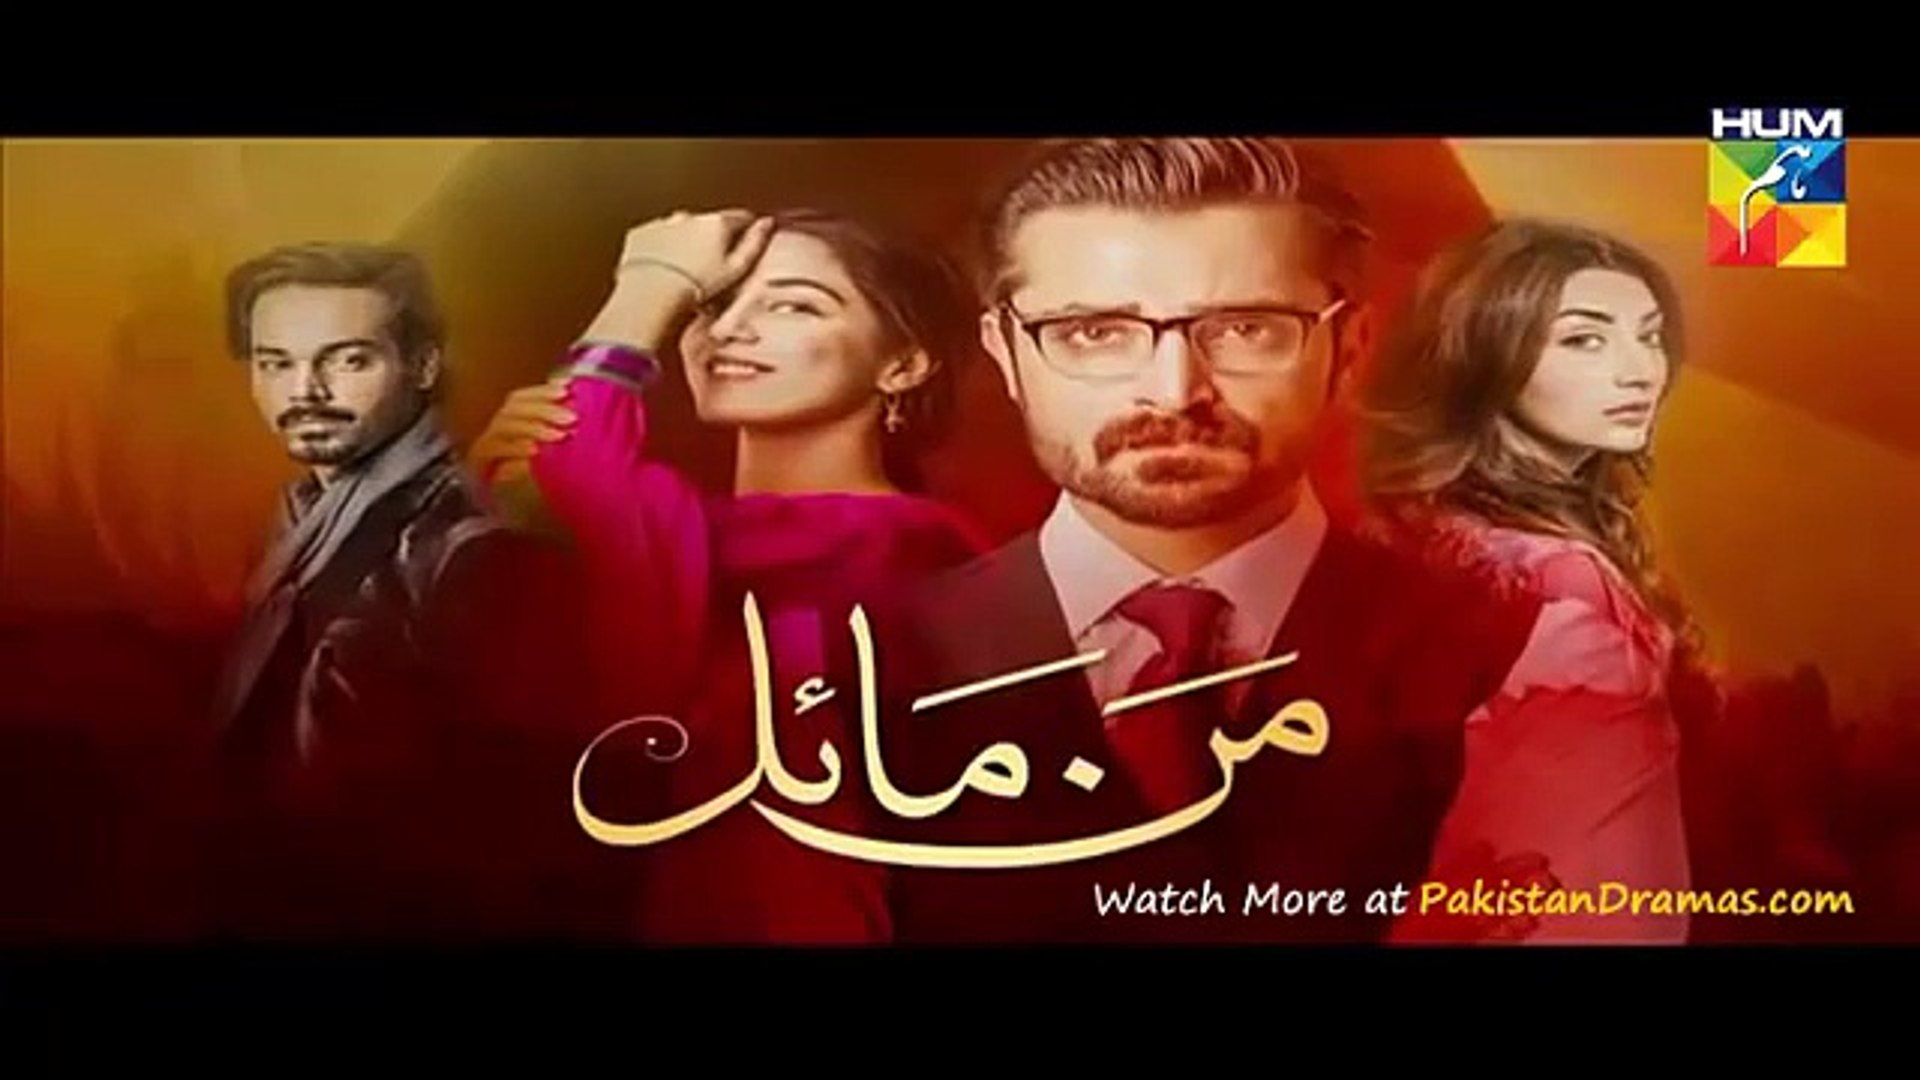 Mann Mayal by Hum Tv - Episode 5 - Promo